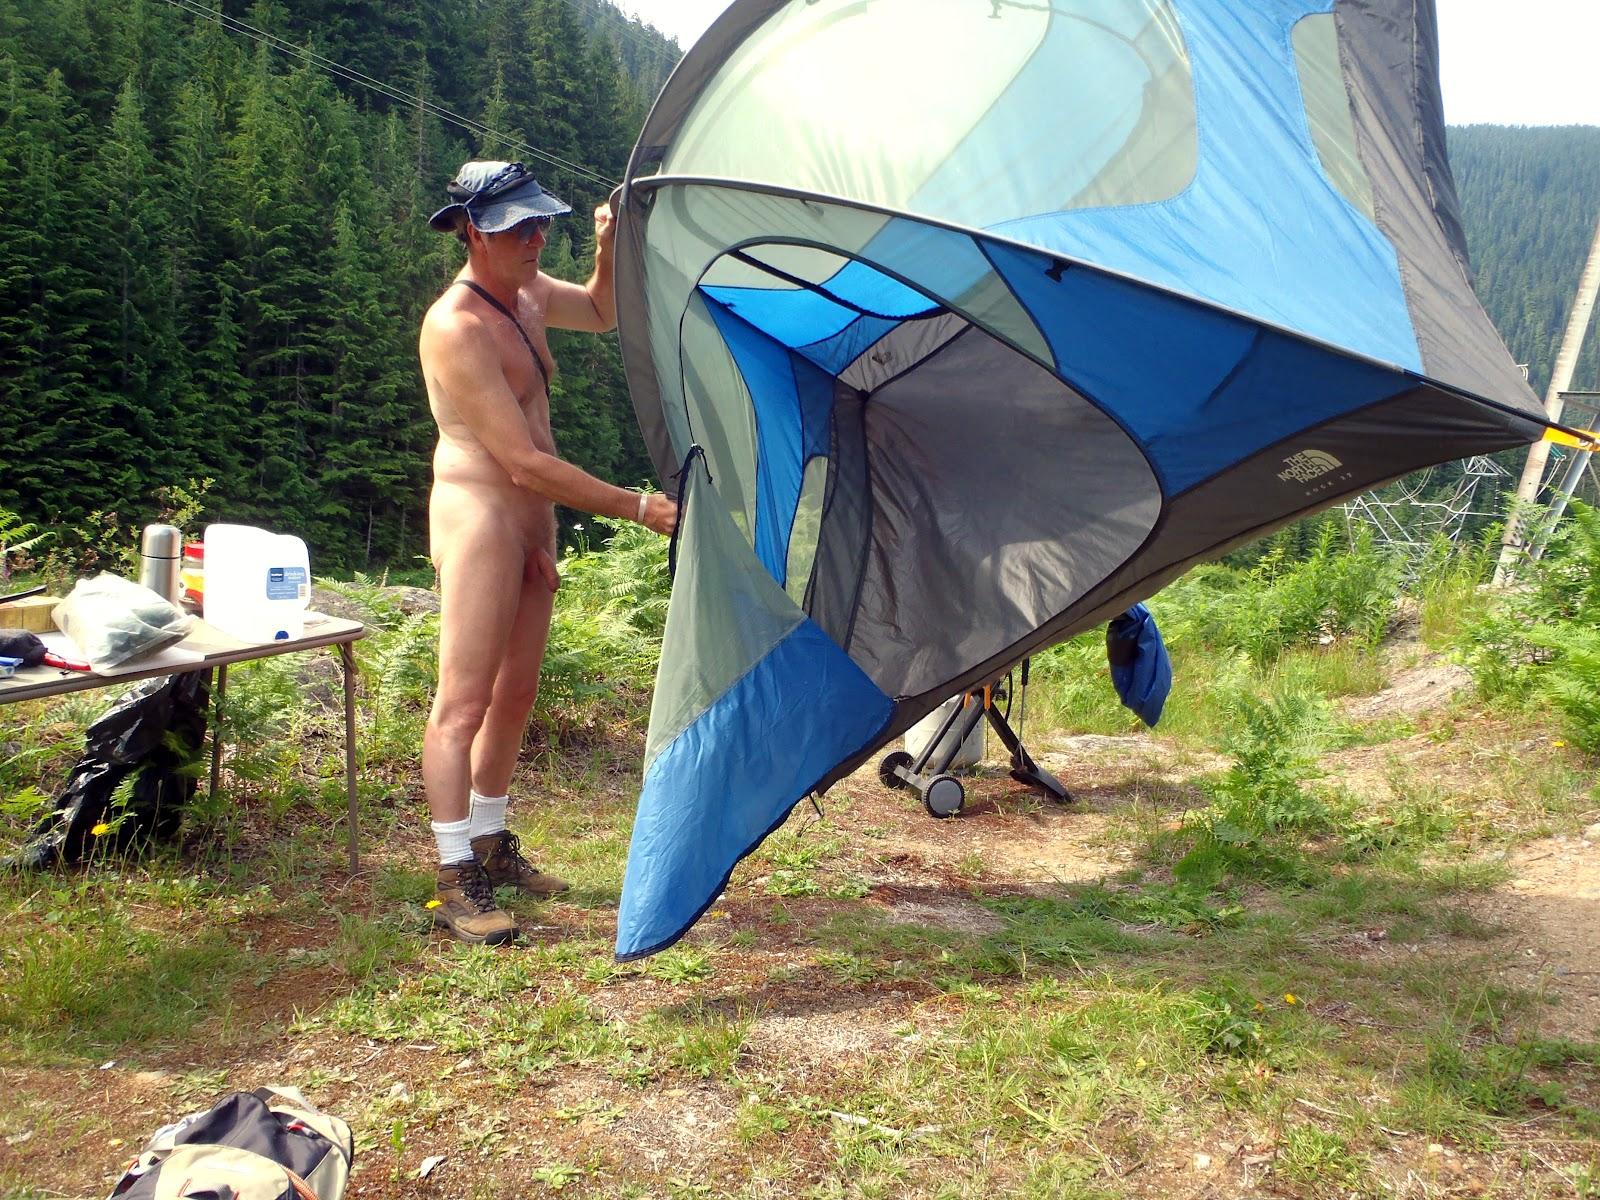 pacific northwest nudist camps